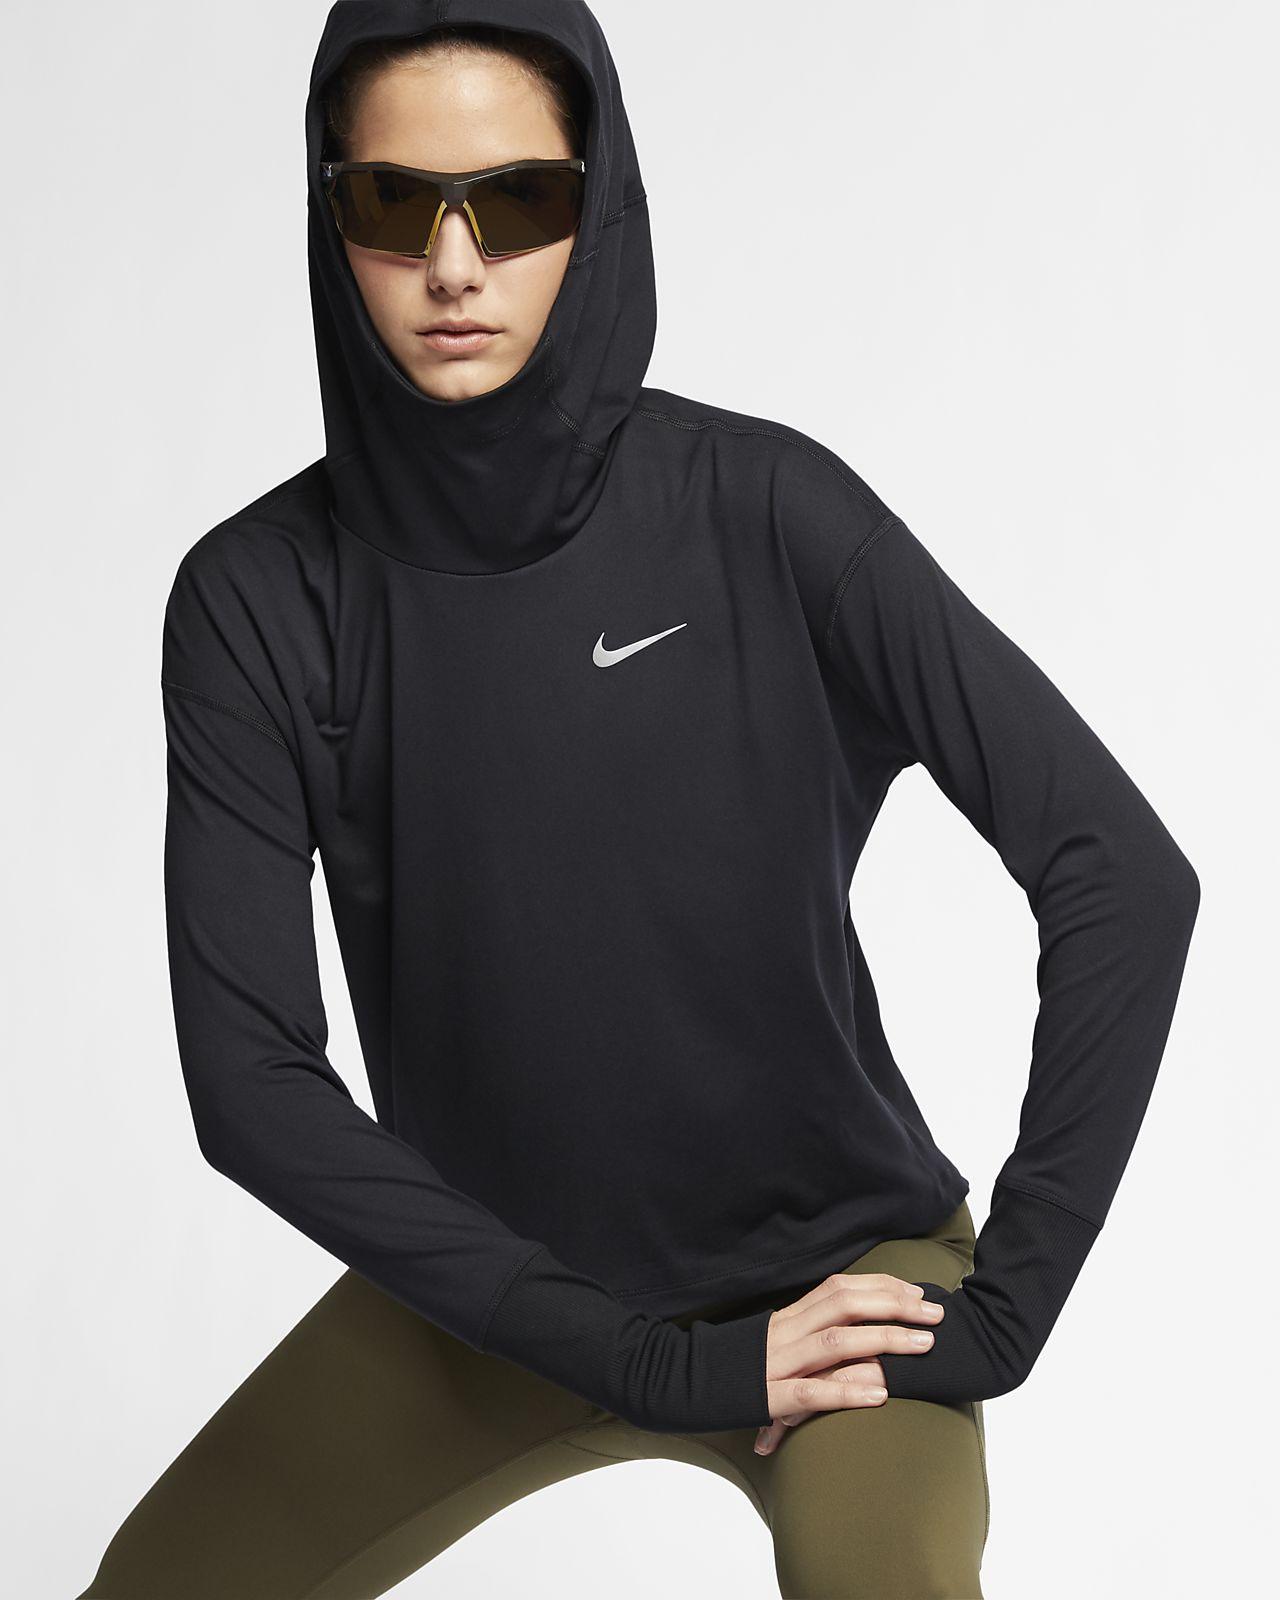 Nike Sudadera con capucha de running - Mujer